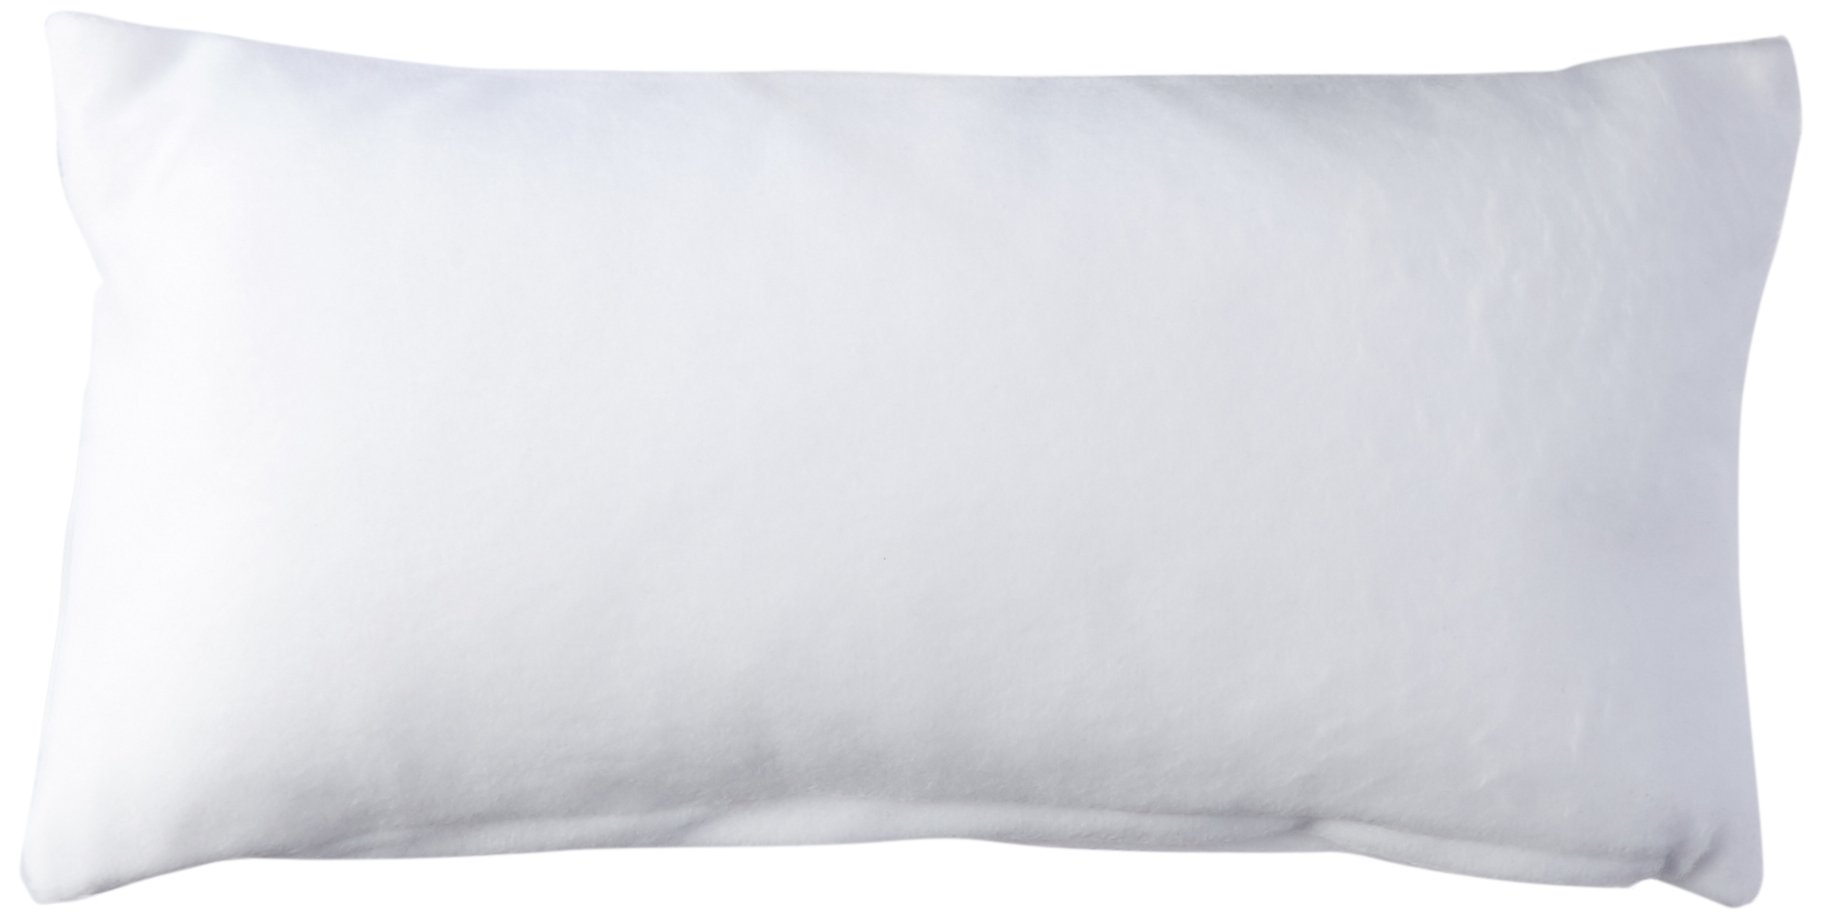 Bath Bead Pillow - Luxury Spa Headrest and Neck Cushion - Absorbent ...